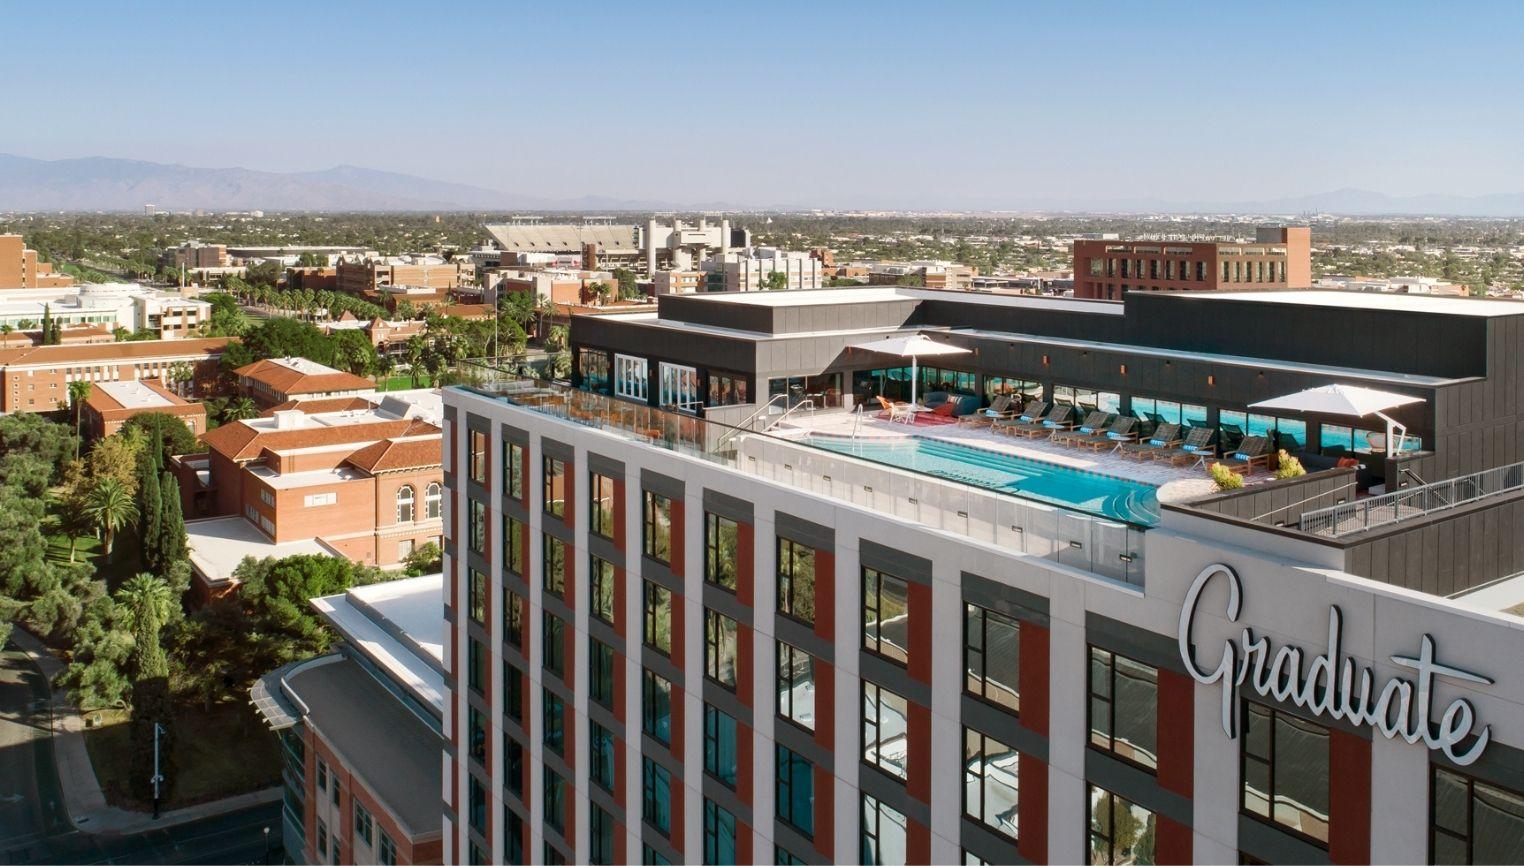 Graduate Tucson Rooftop